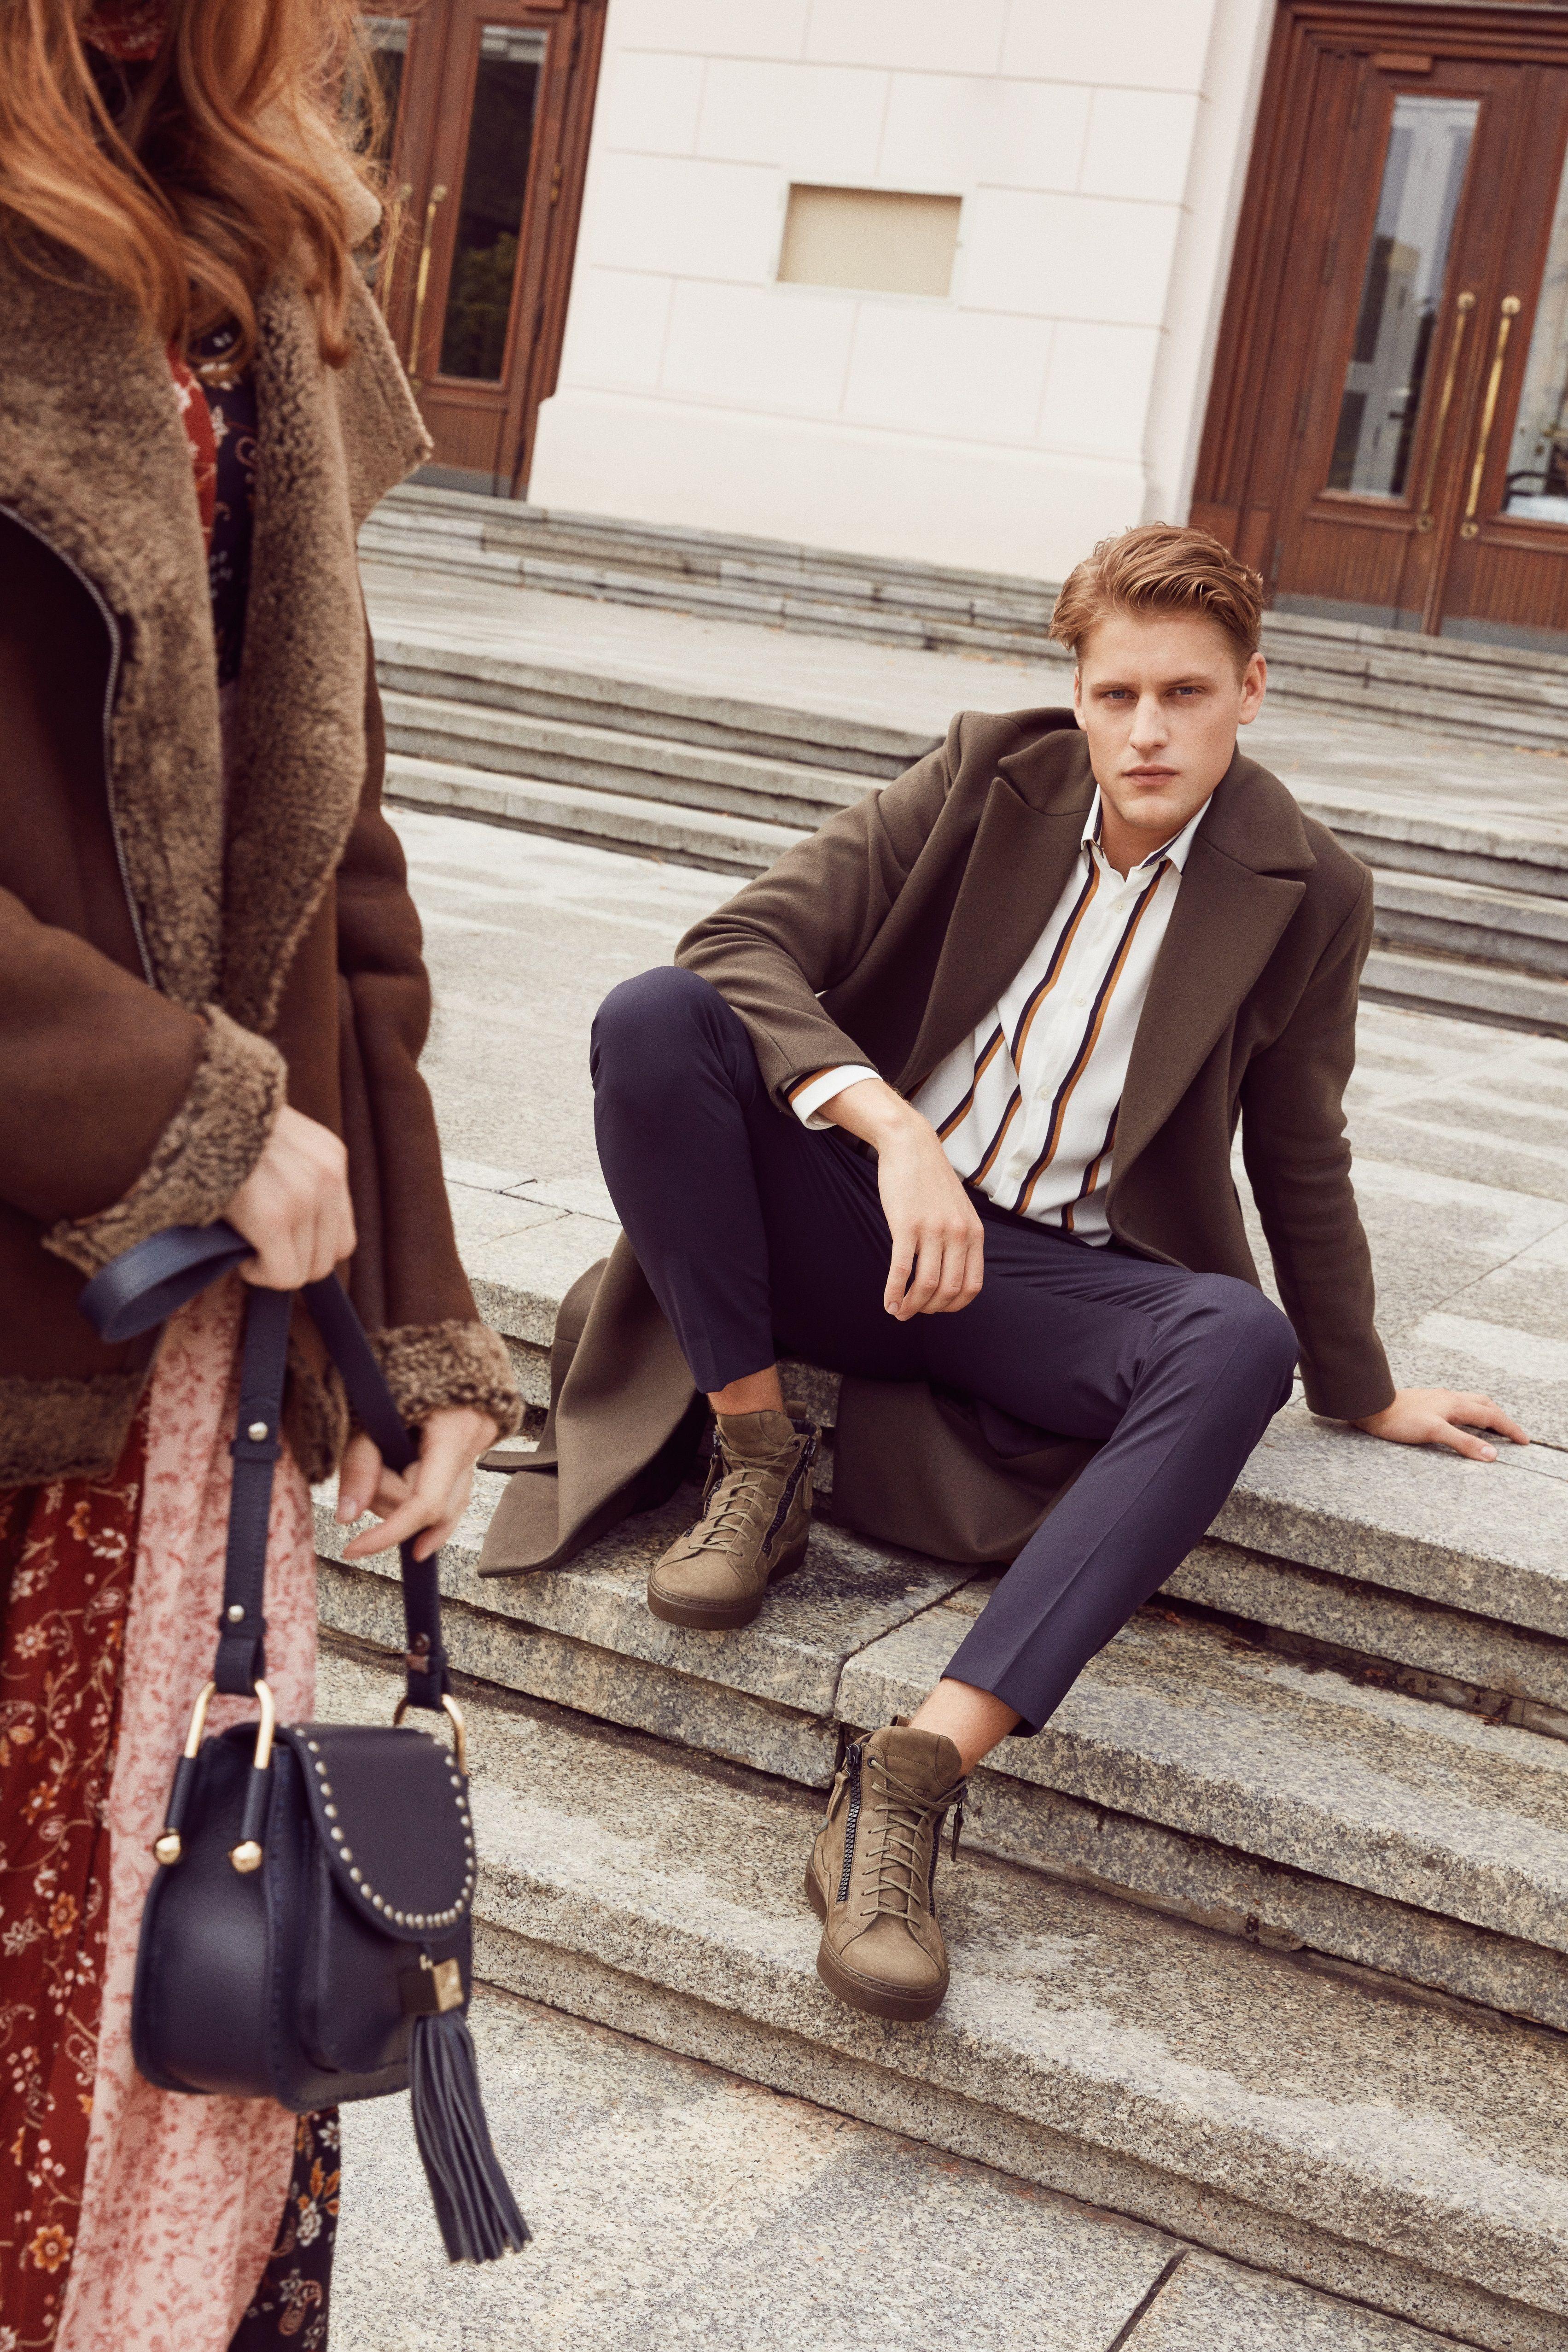 Zielone Trampki Meskie Leo Z Kolekcji Jesien Zima 2018 Fashion Style Lookbook